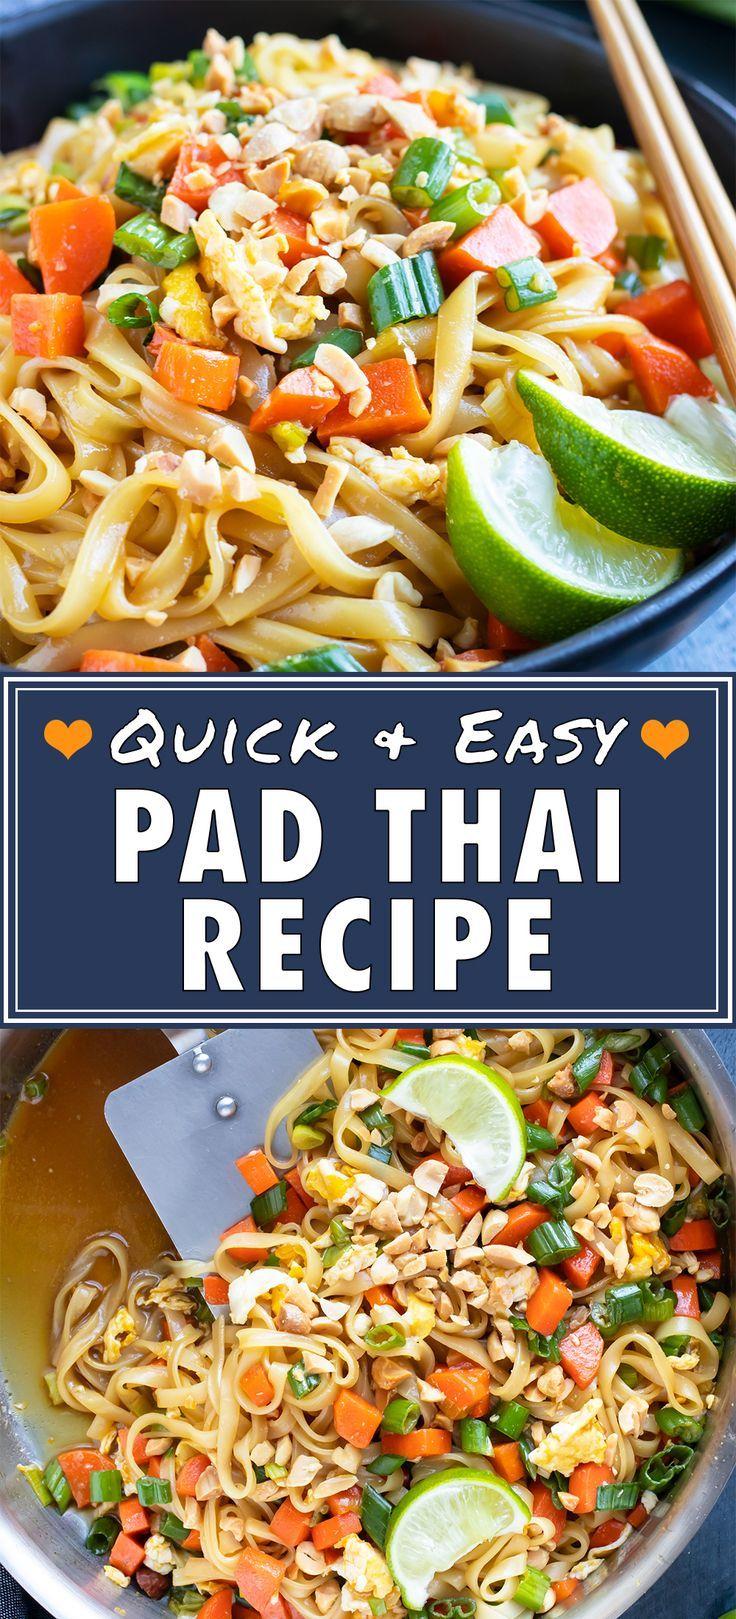 Easy pad thai recipe food recipes vegetarian entrees